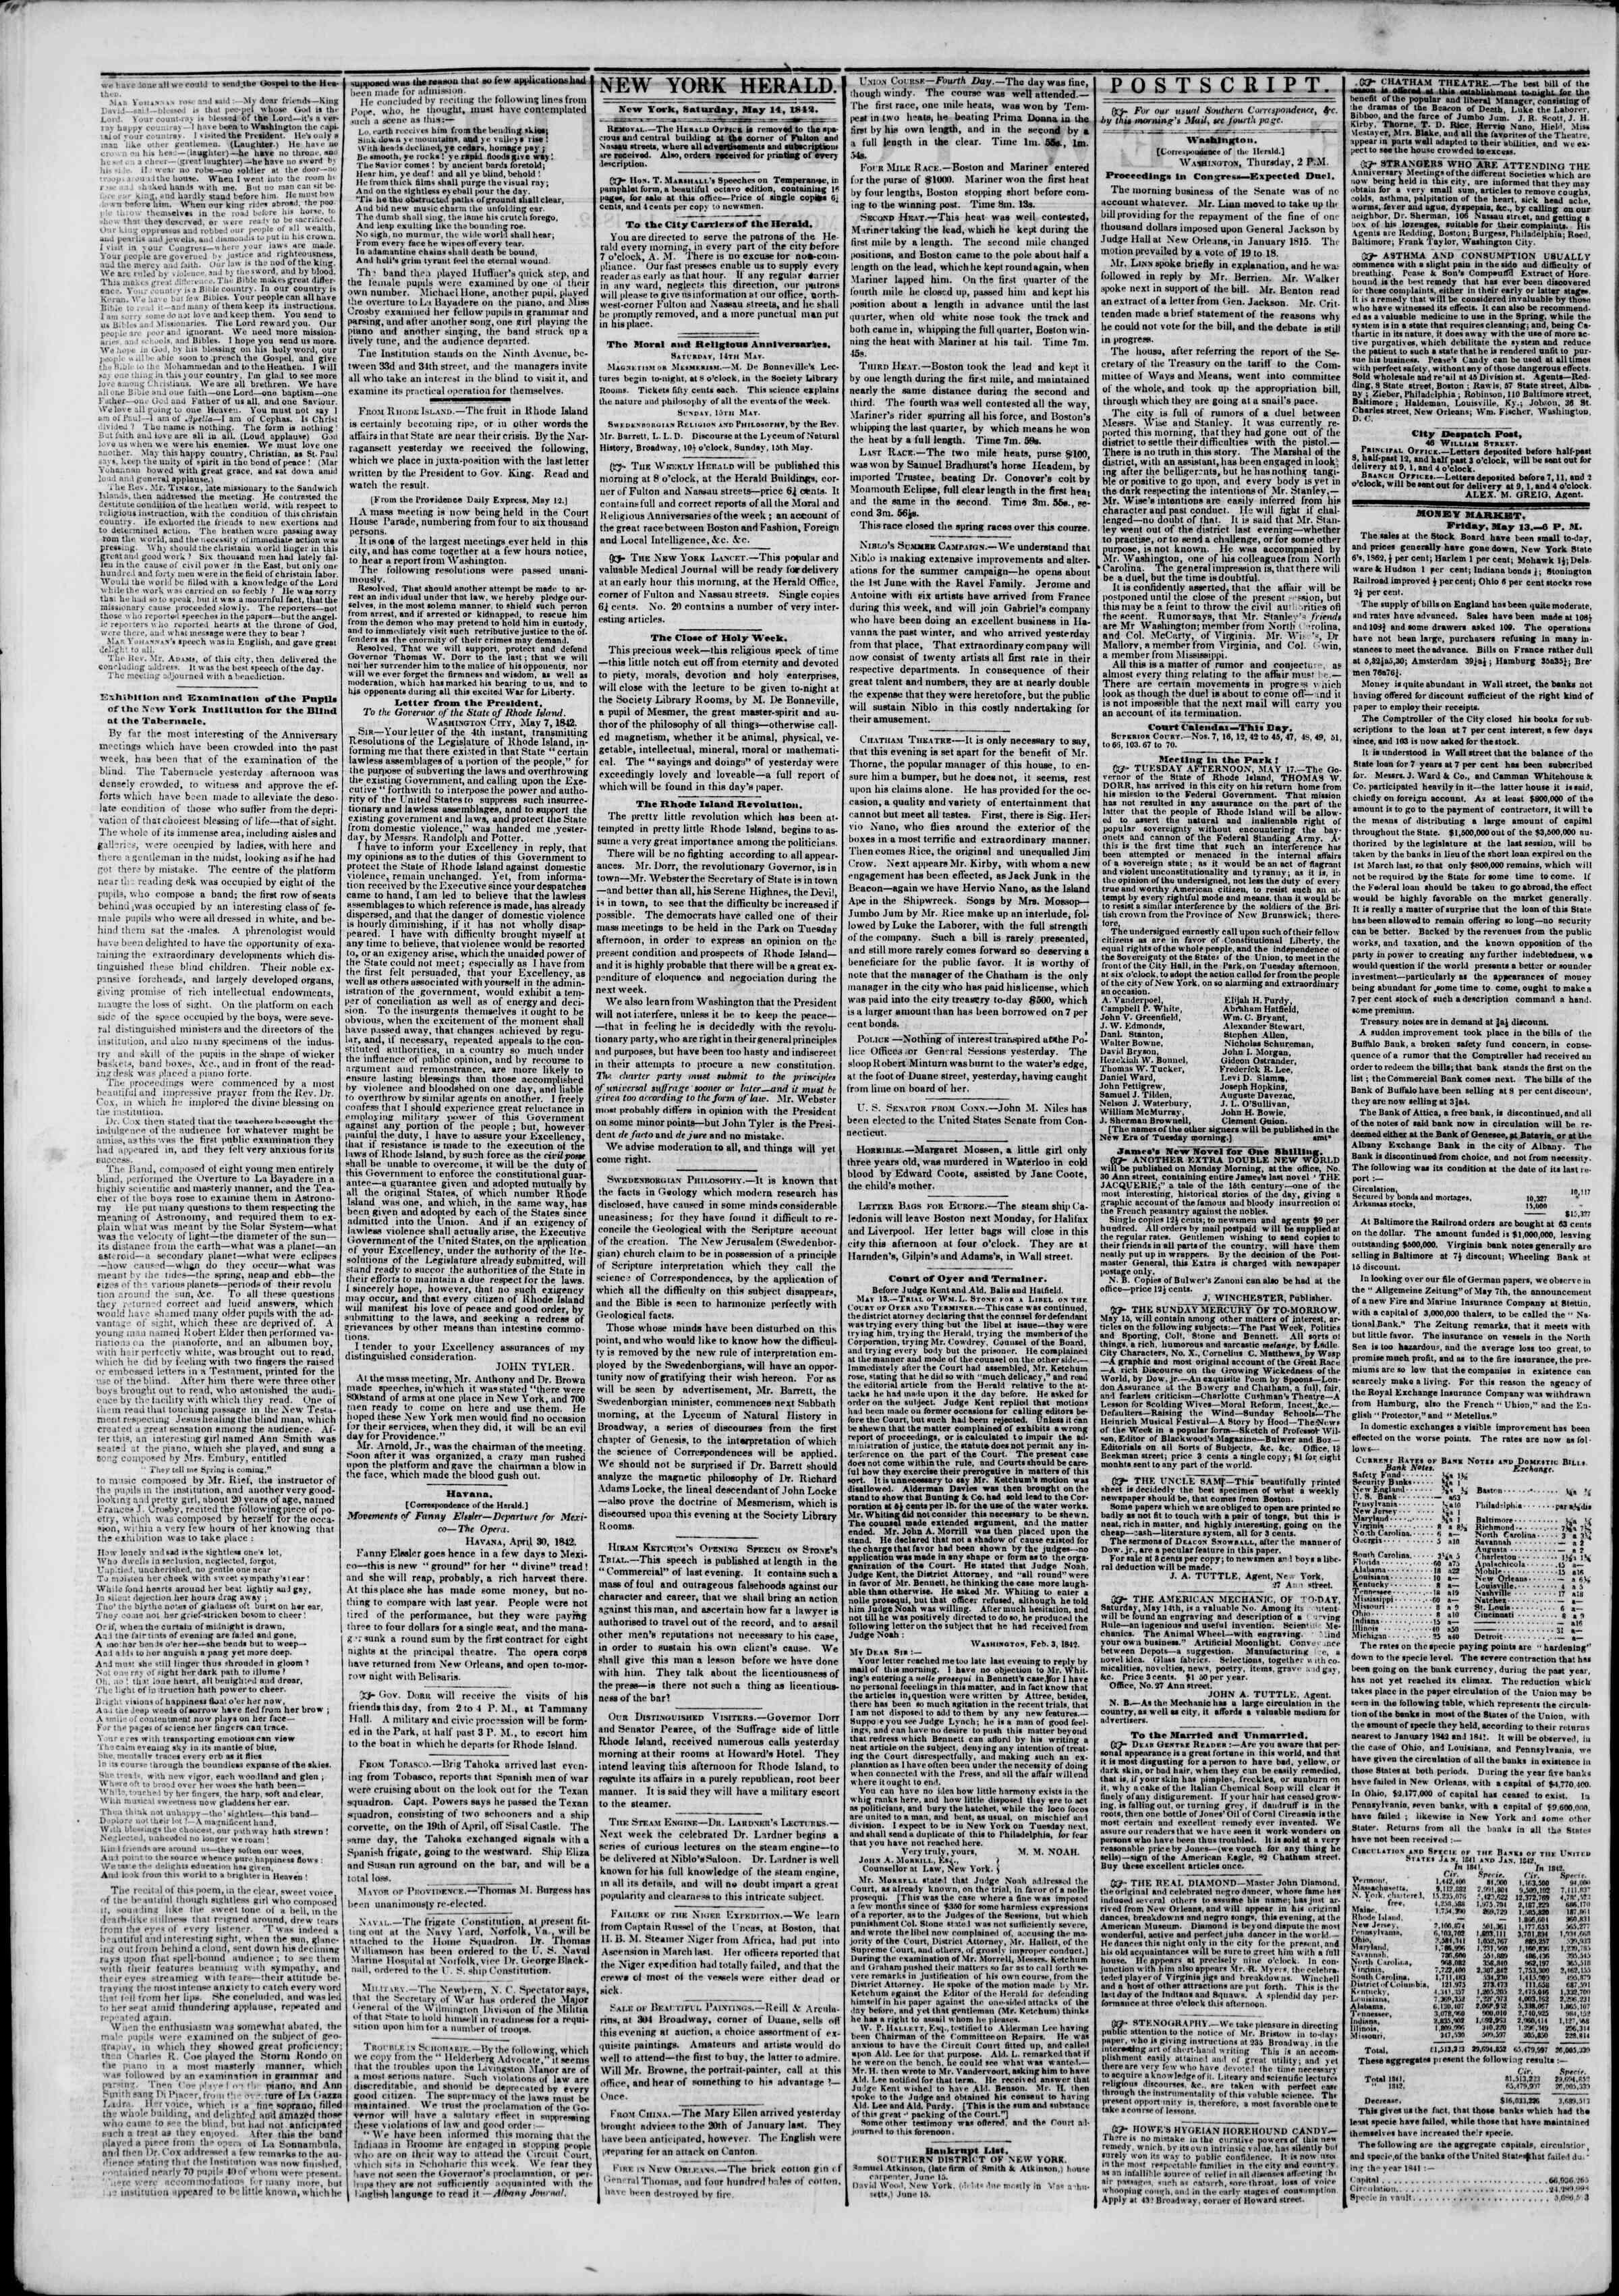 May 14, 1842 Tarihli The New York Herald Gazetesi Sayfa 2